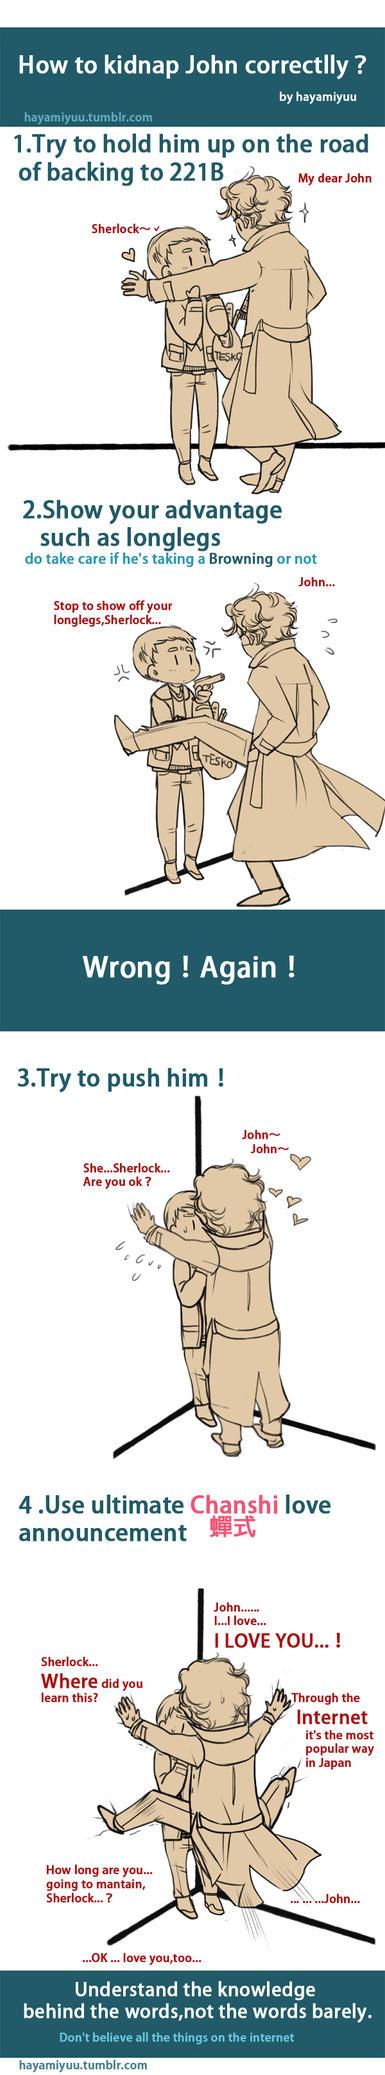 How to kidnap John correctlly? by hayamiyuu